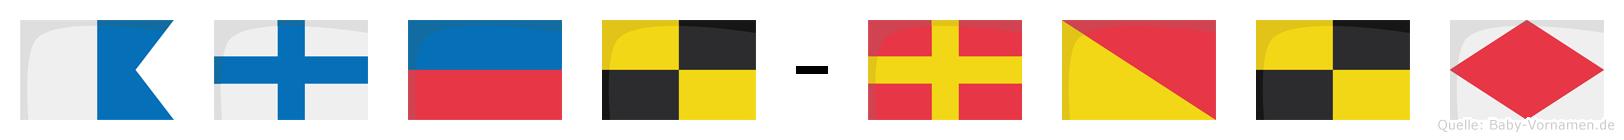 Axel-Rolf im Flaggenalphabet